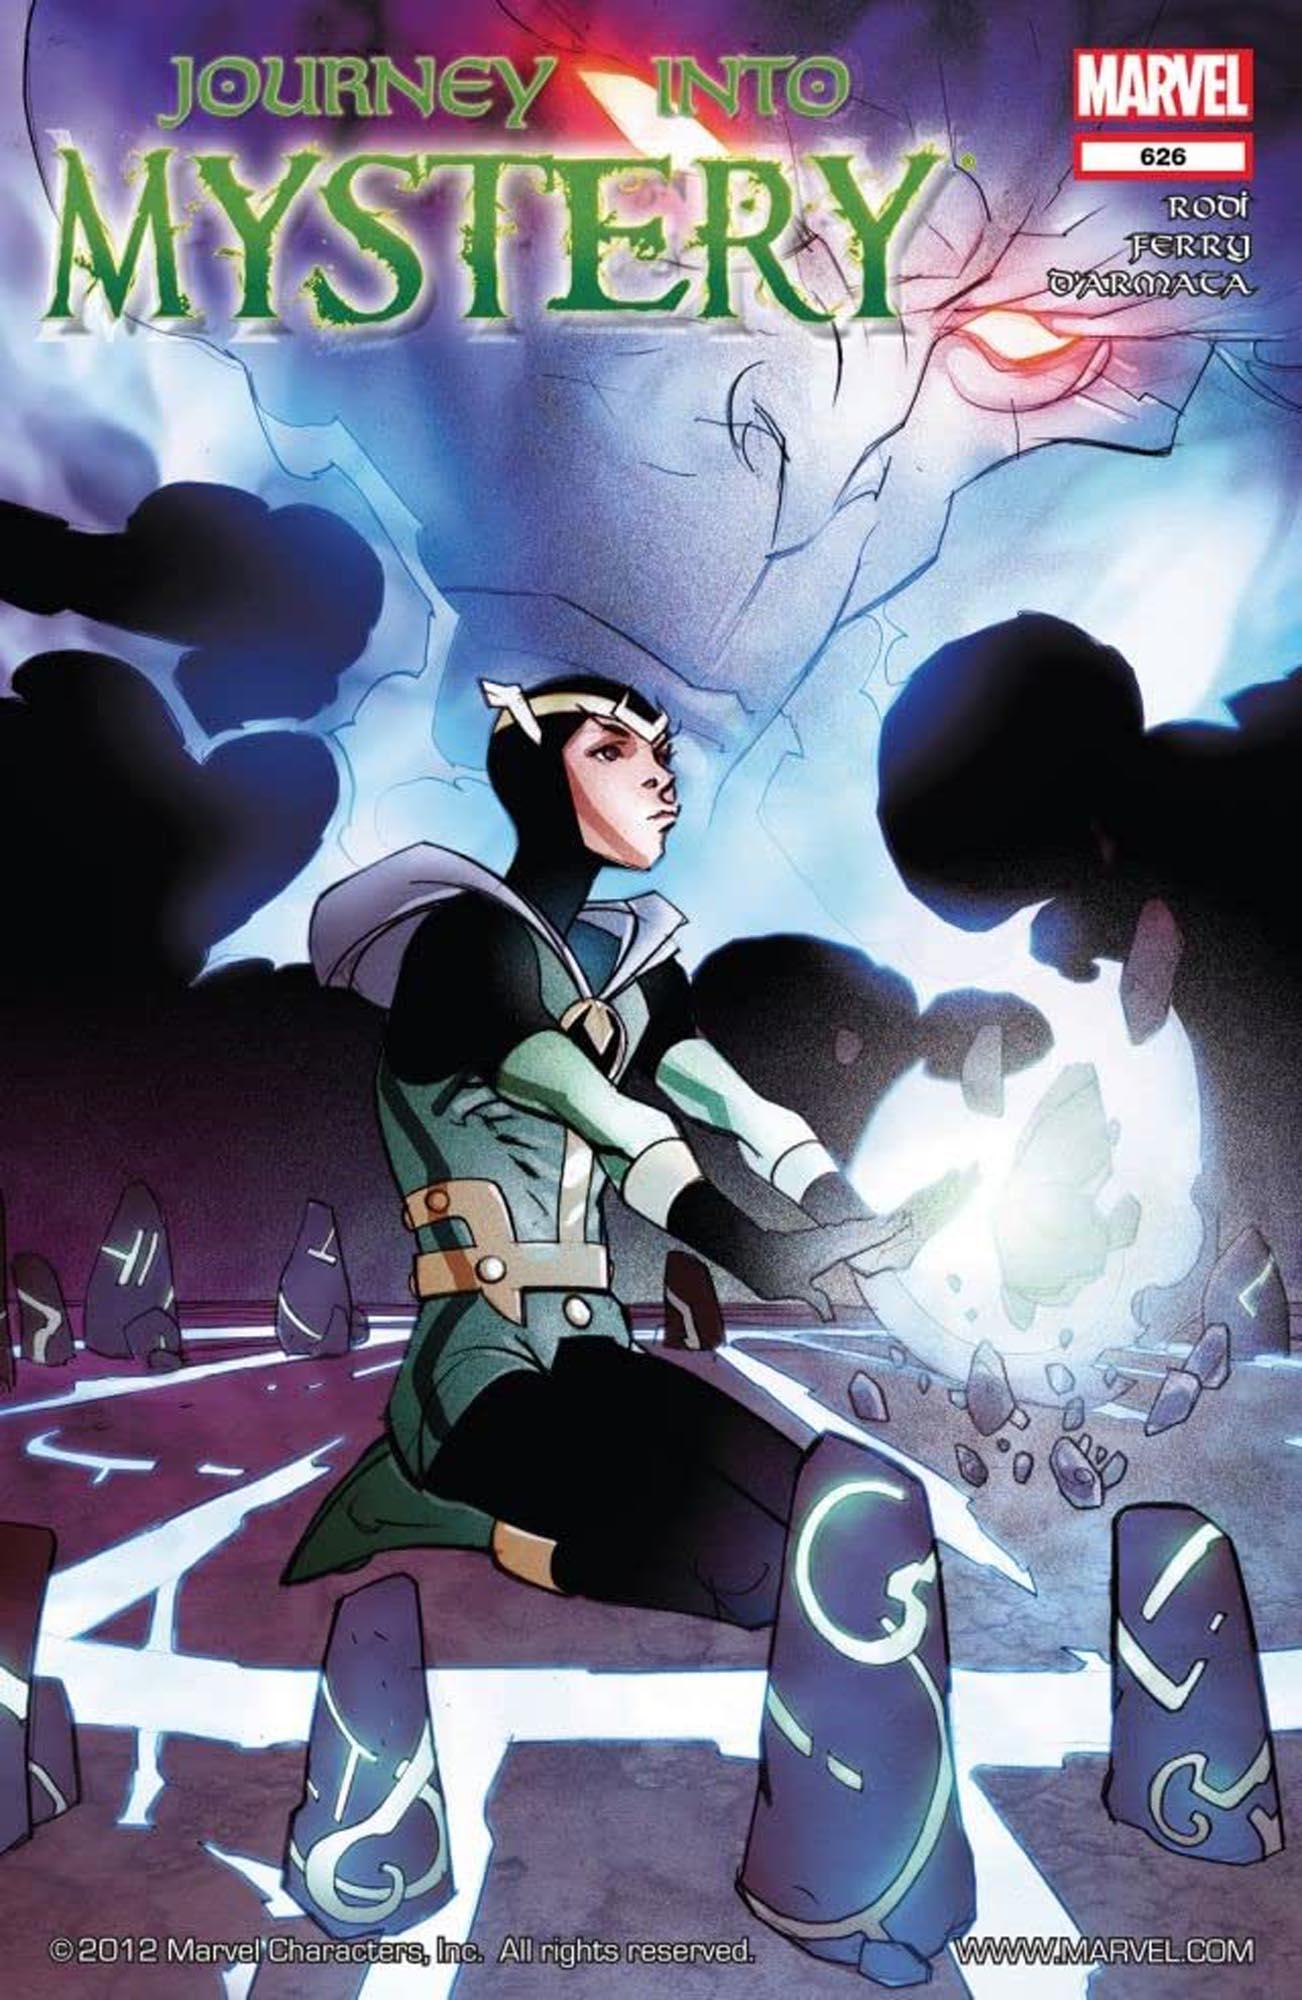 Loki comics - Journey Into Mystery